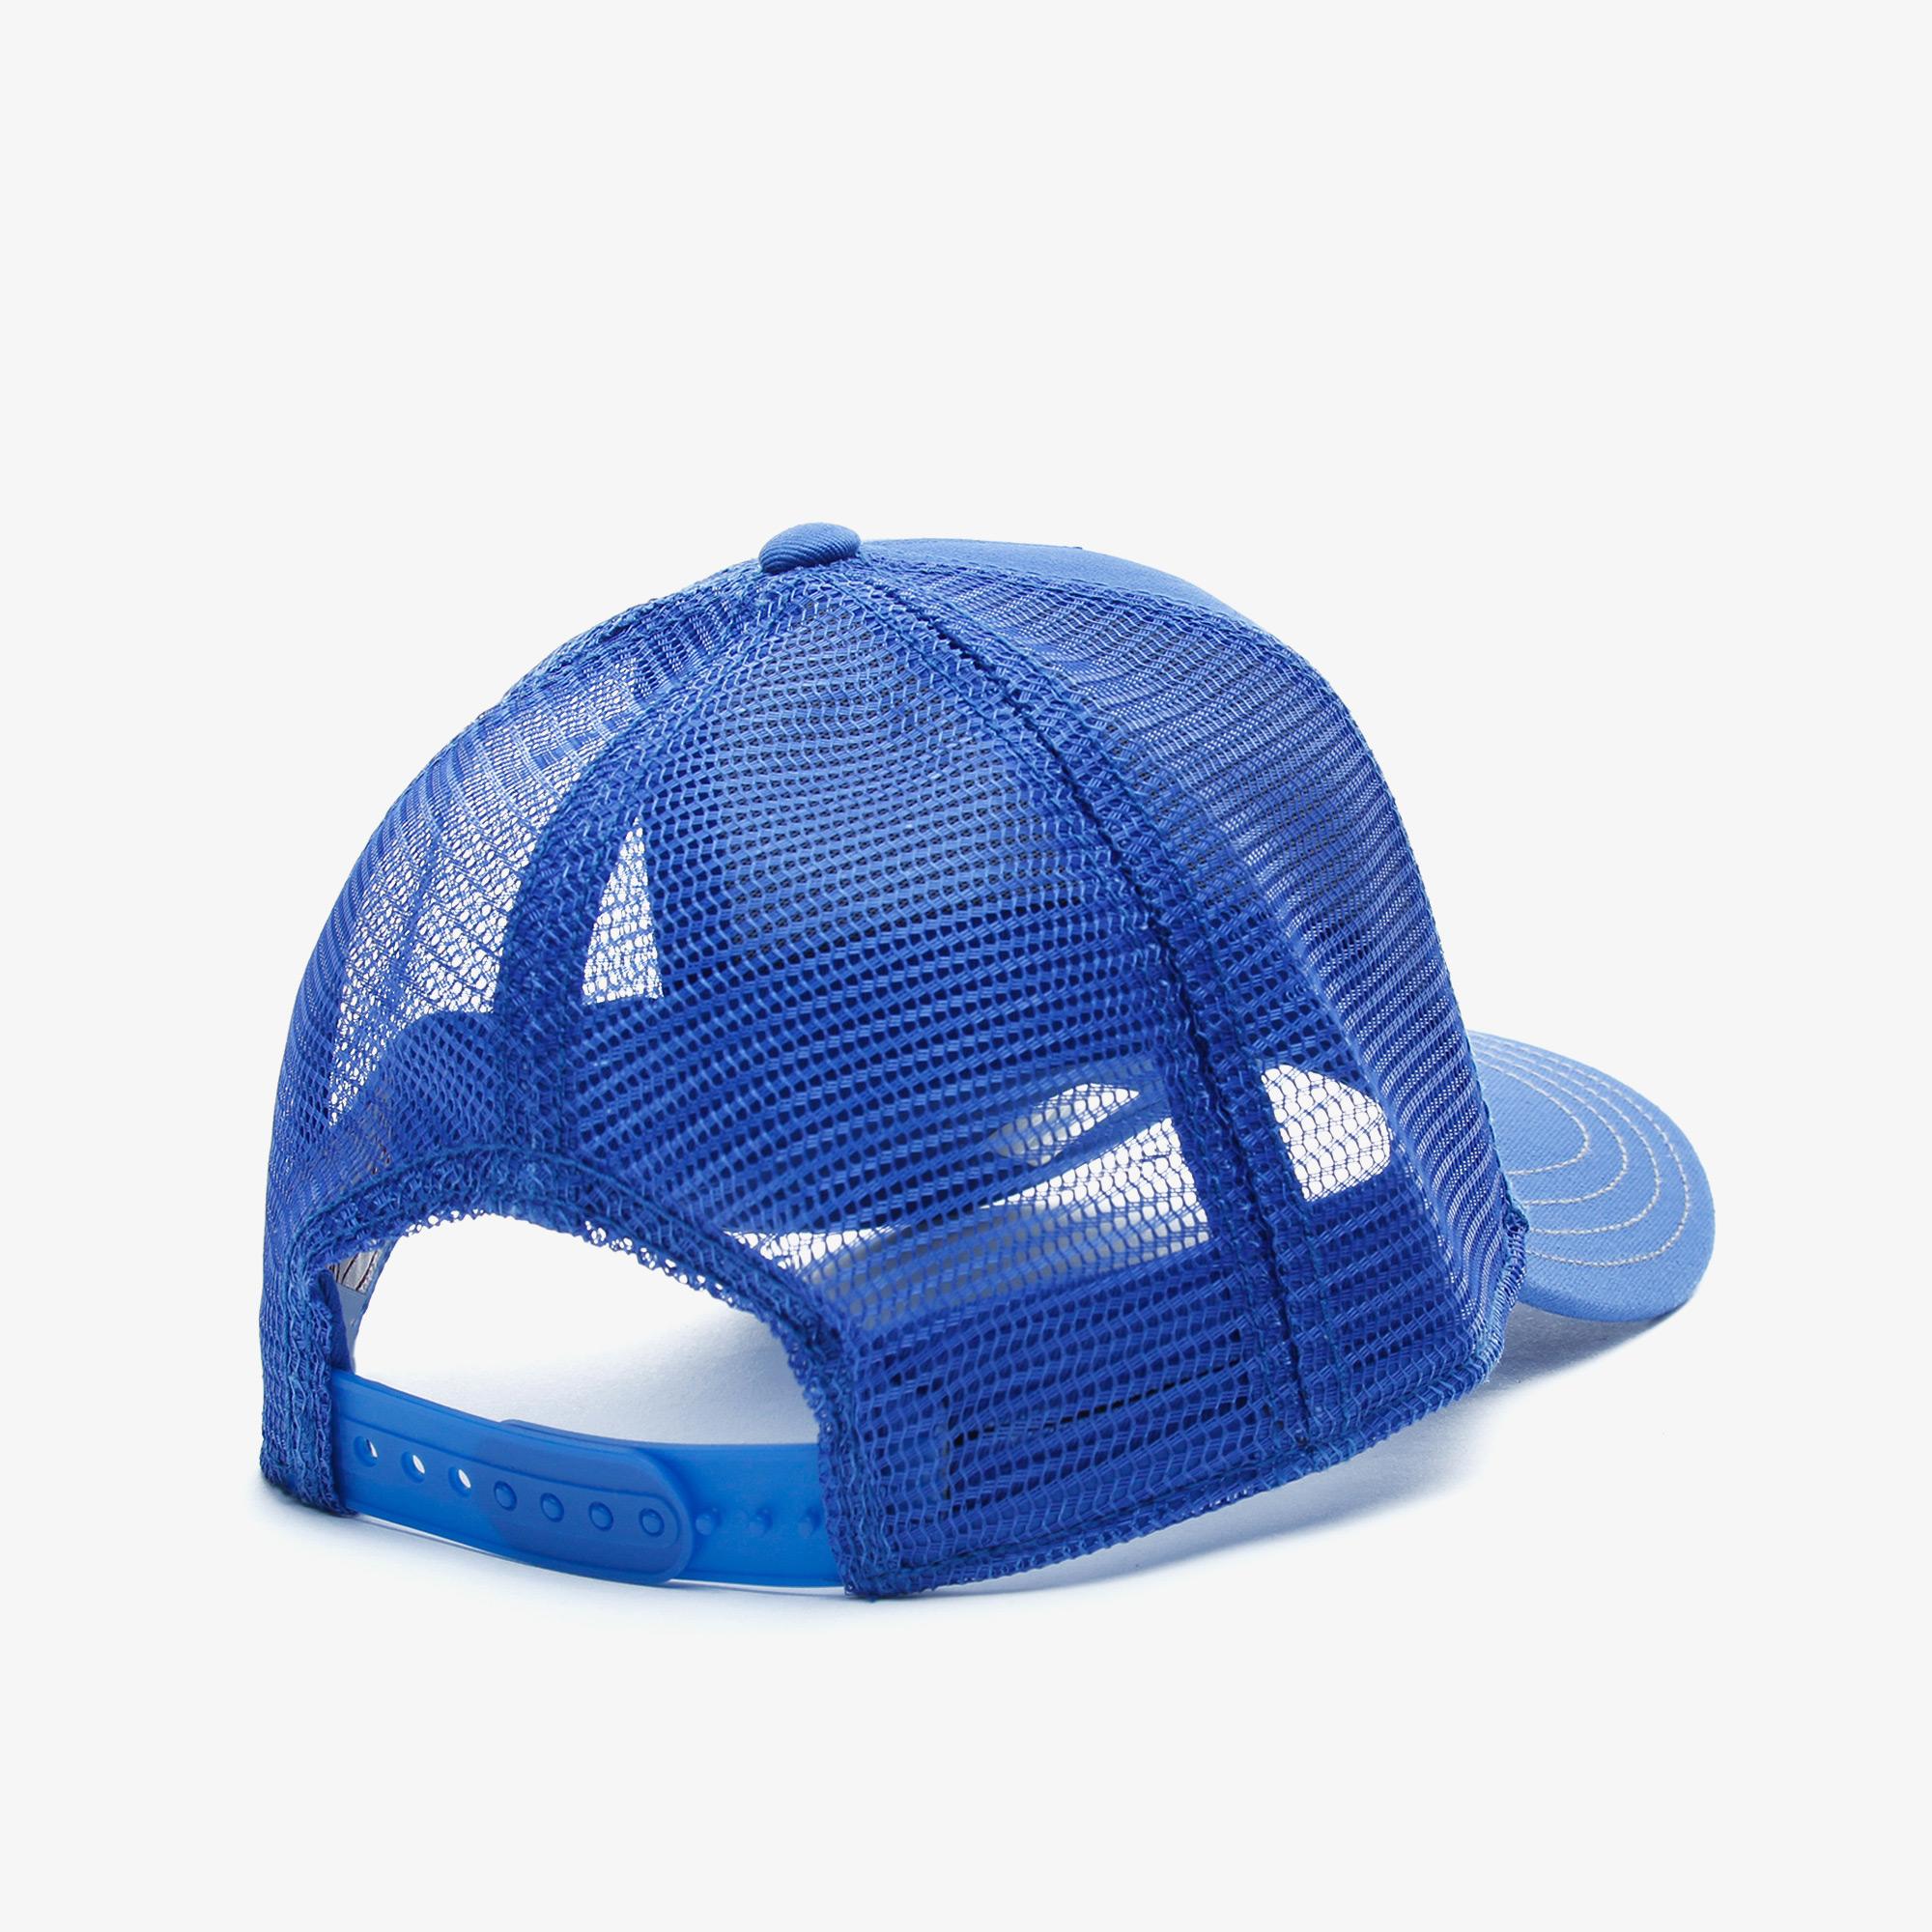 Goorin Bros Chomp Chomp Unisex Mavi Şapka